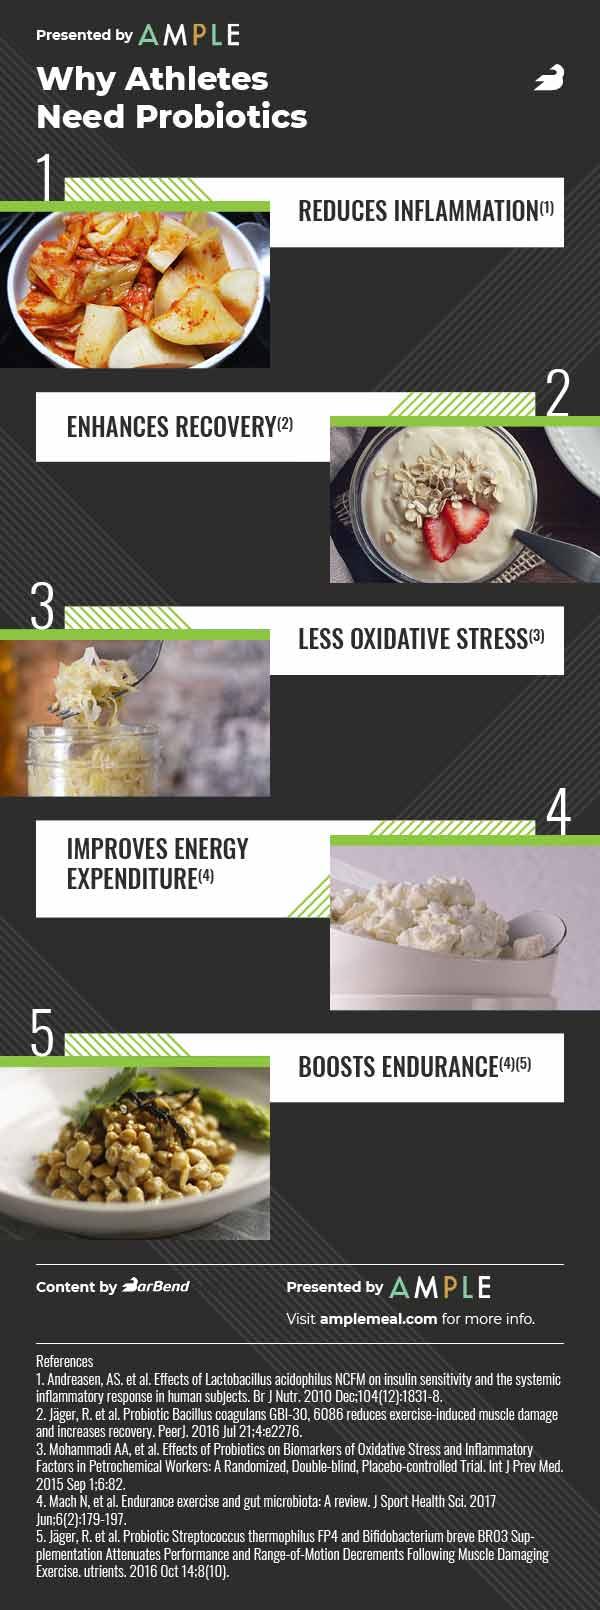 Why Athletes Need Probiotics